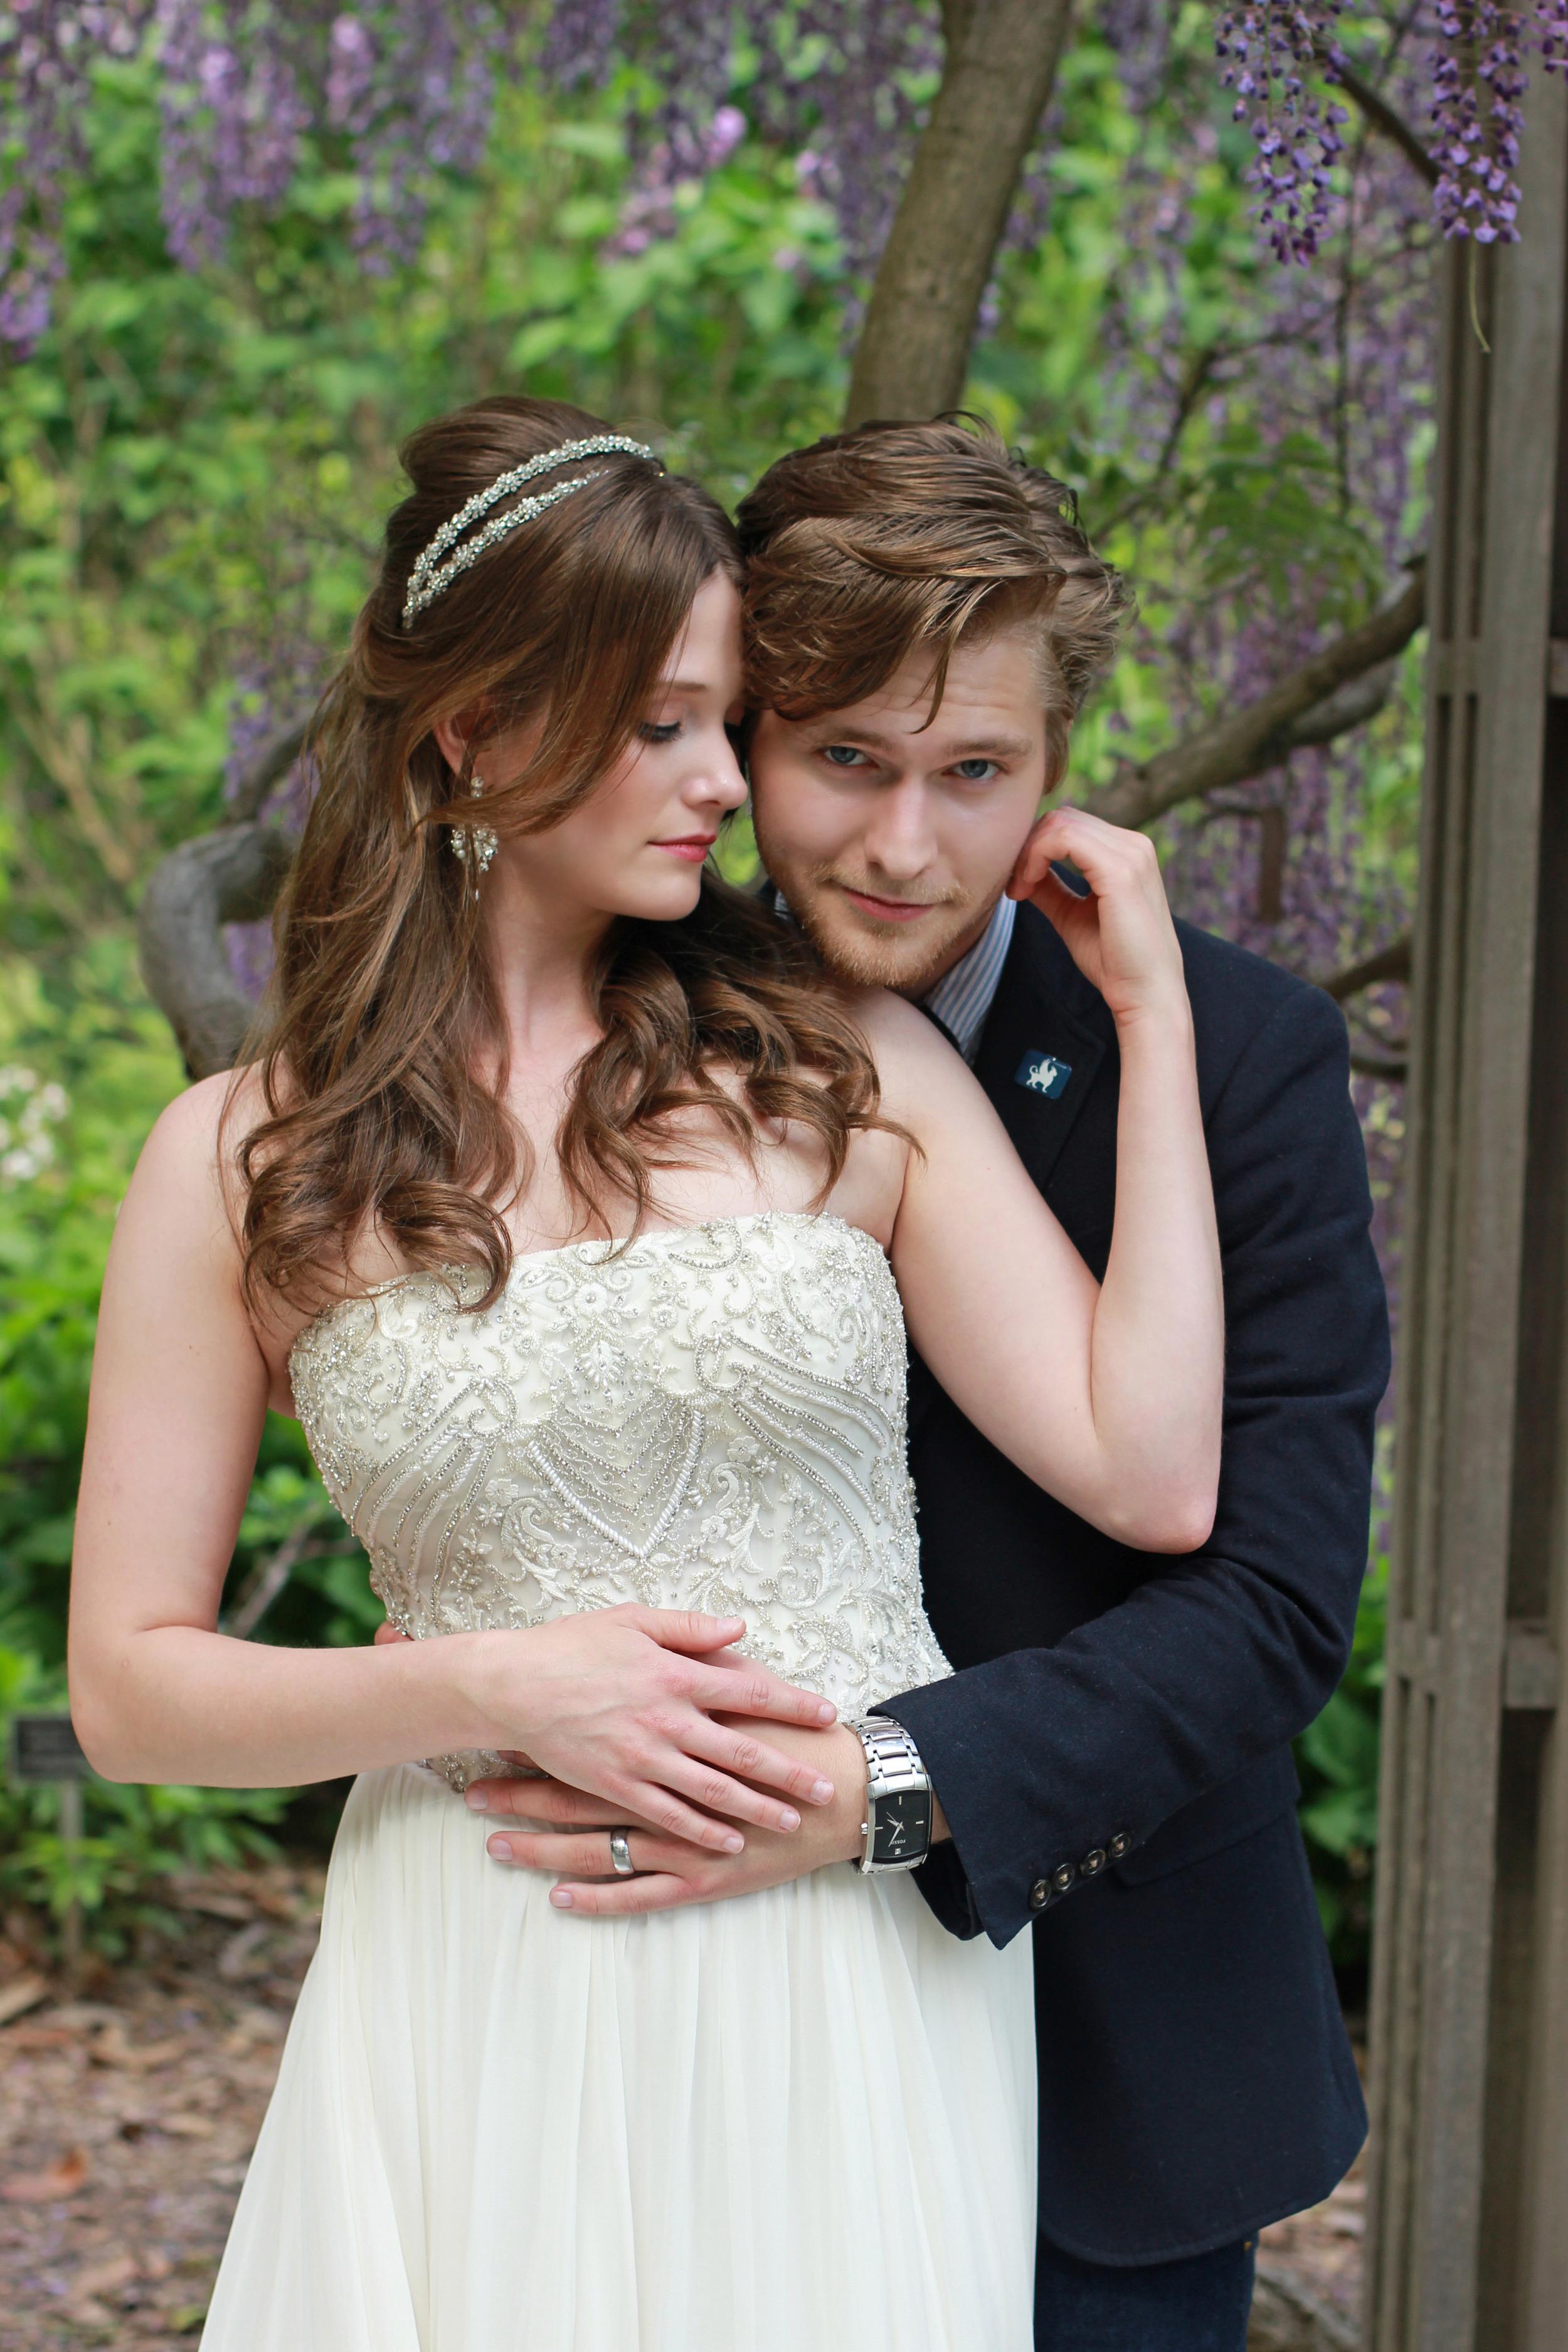 Bohemian Wedding | Bride & Groom | Brookside Gardens - Jess Rudolph Photography